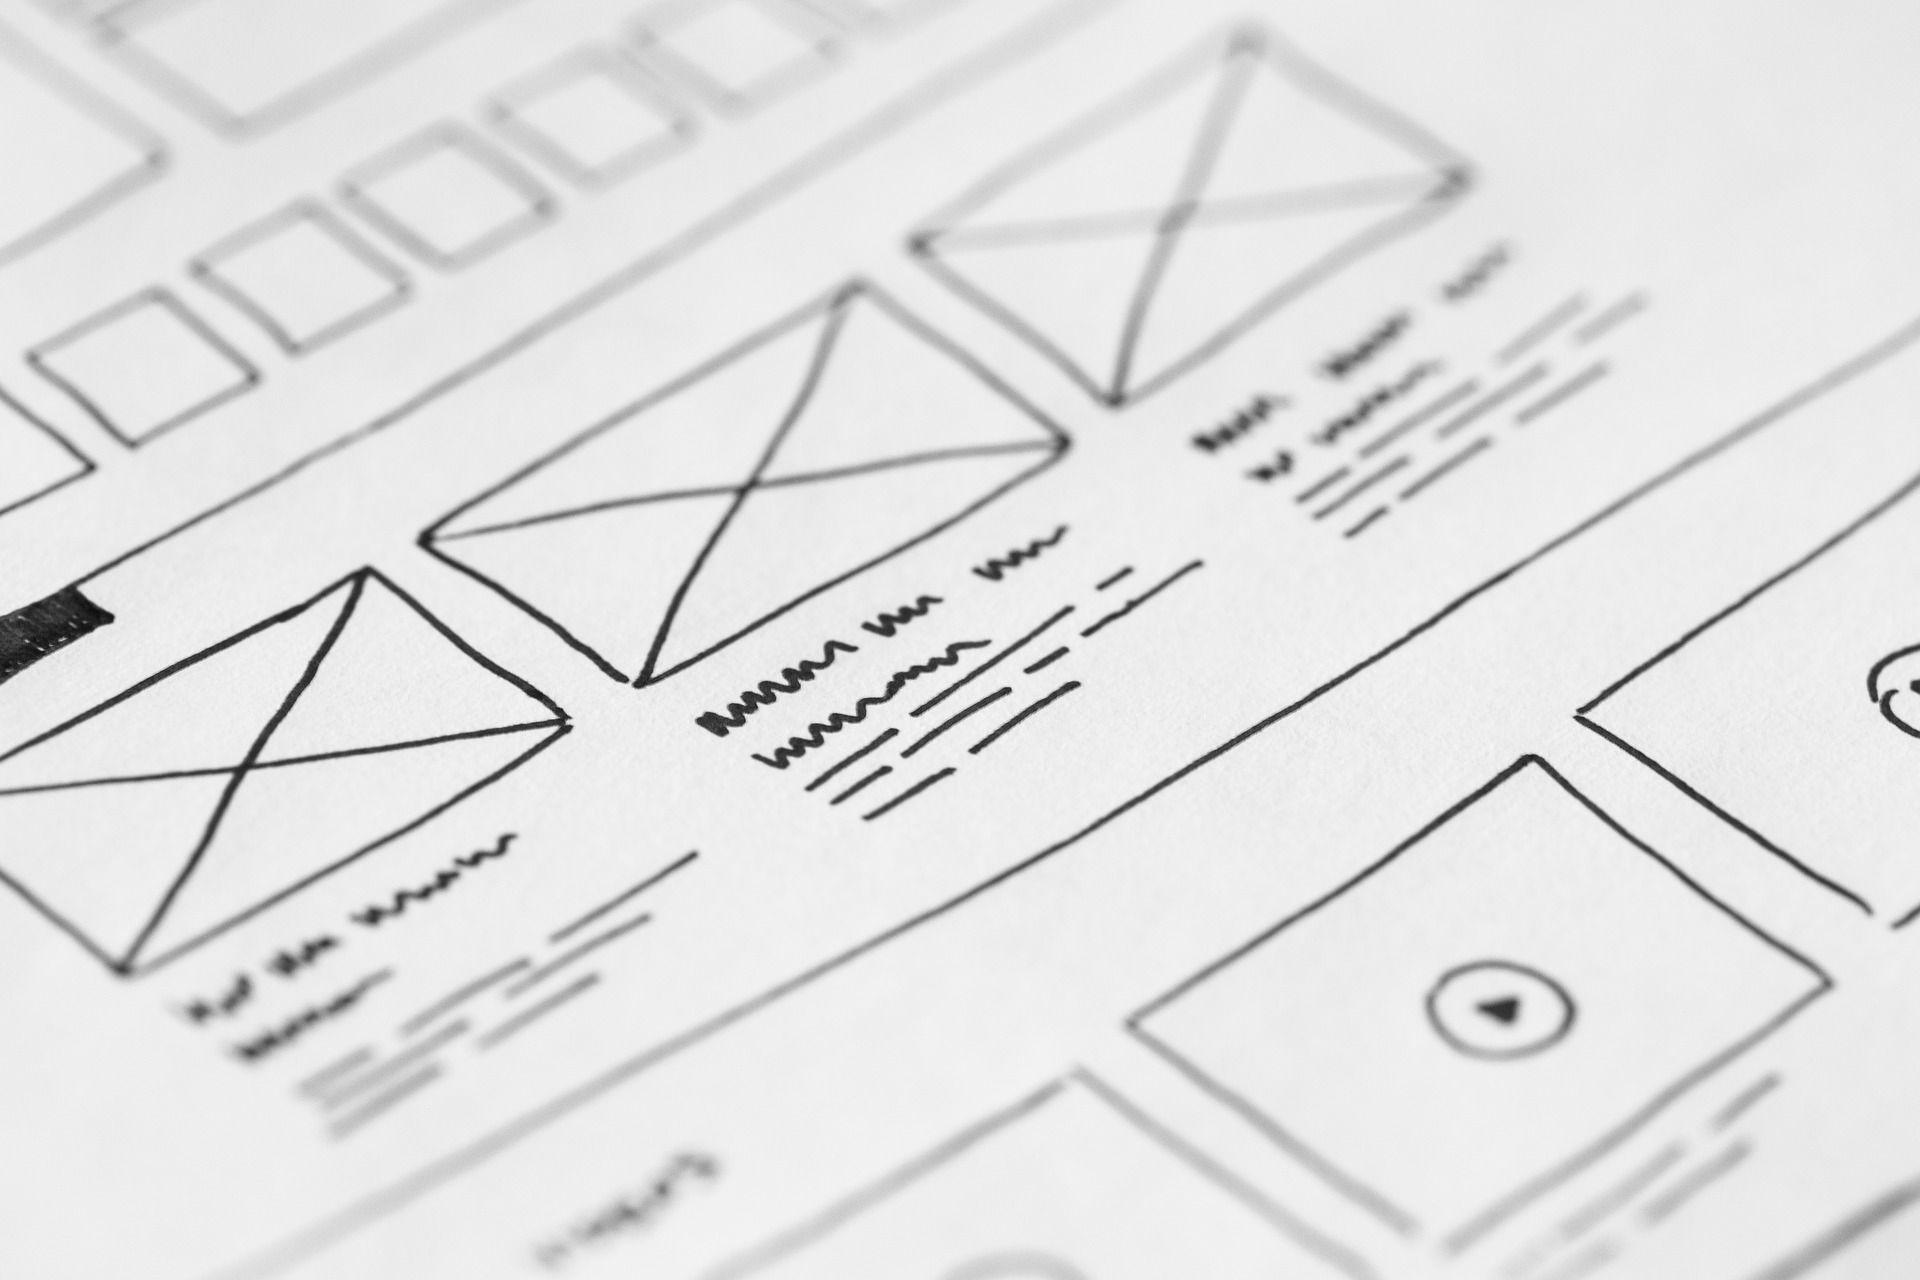 a design document